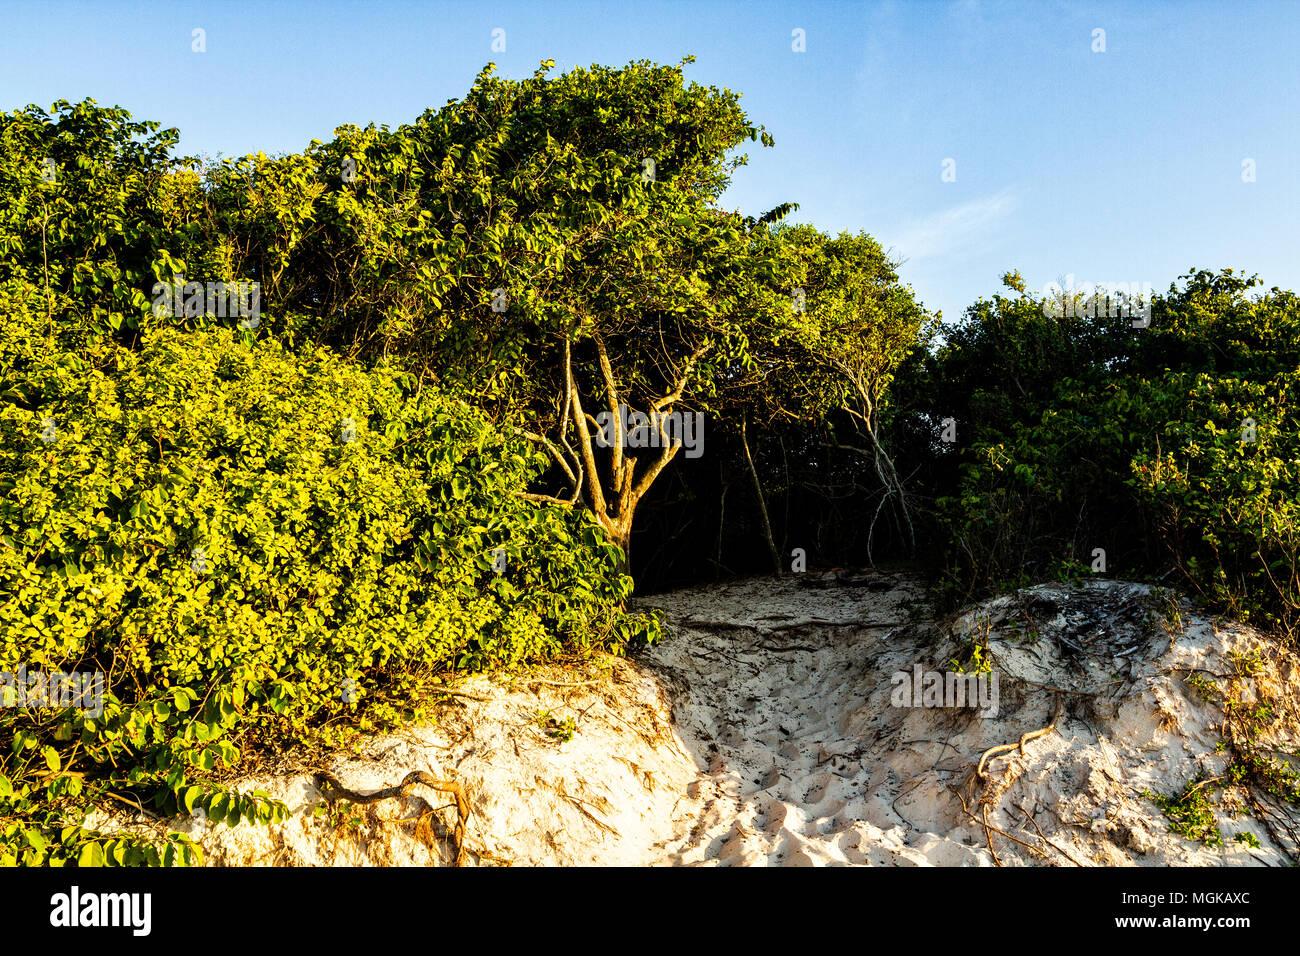 Sandbank vegetation at Daniela Beach. Florianopolis, Santa Catarina, Brazil. - Stock Image